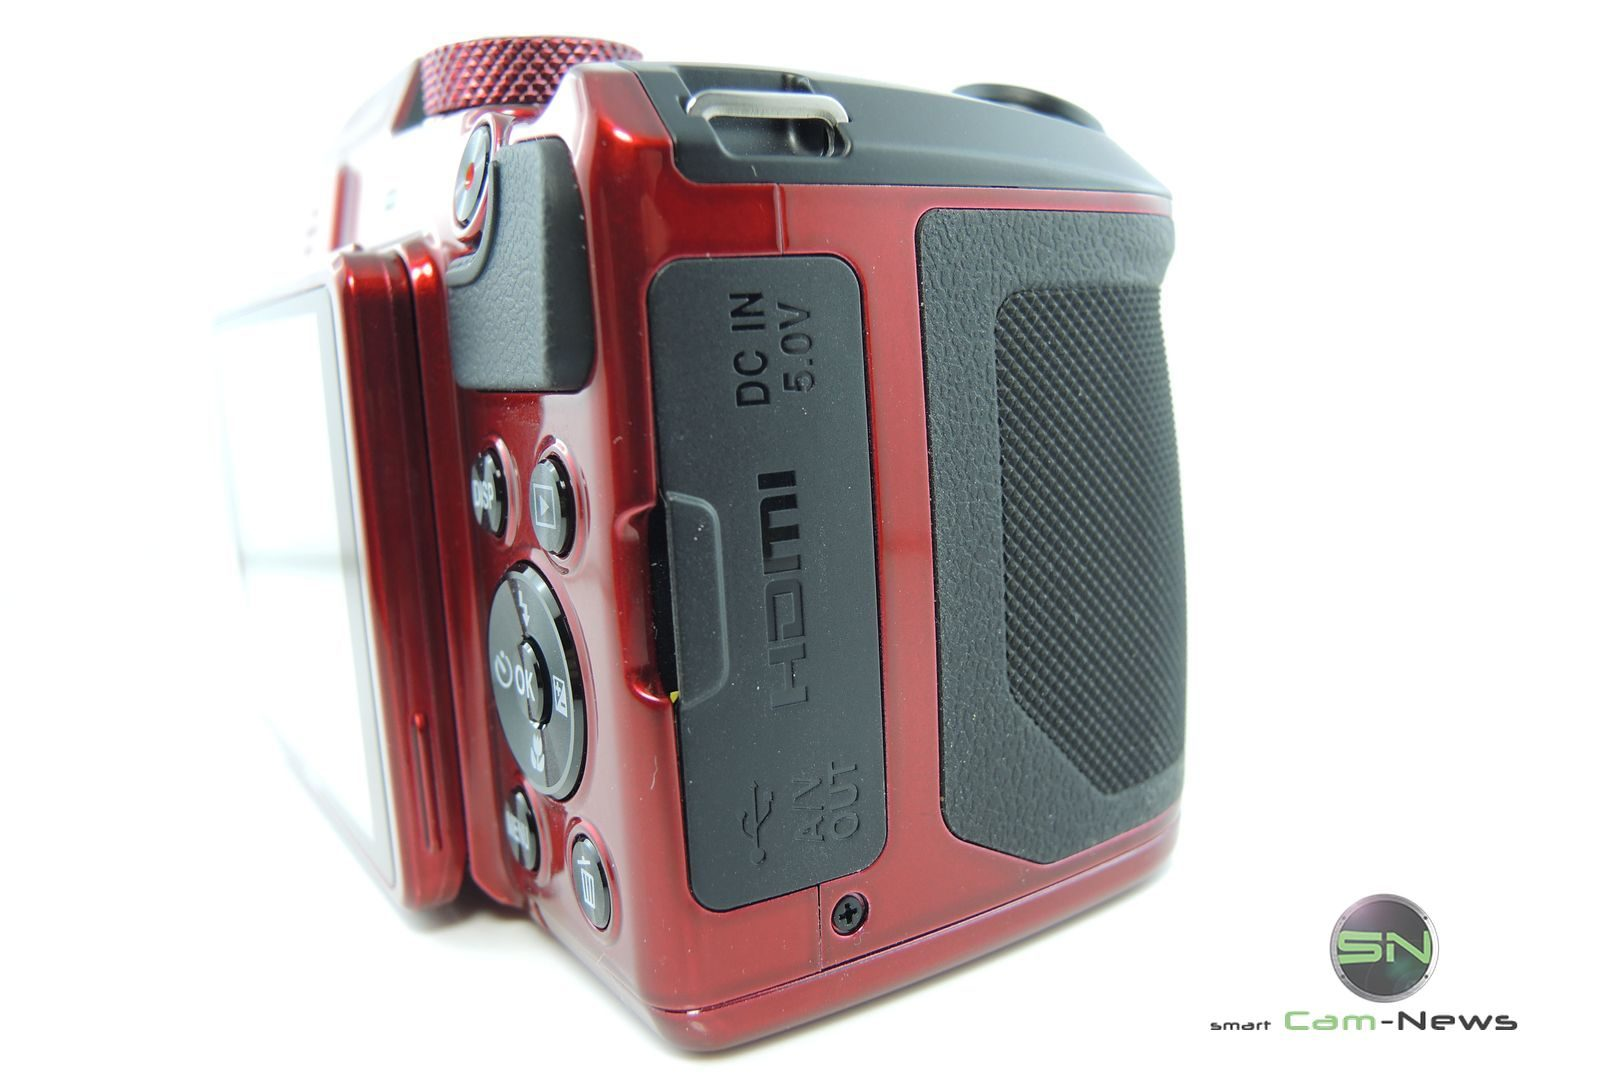 externe-anschluesse-nikon-b500-smartcamnews